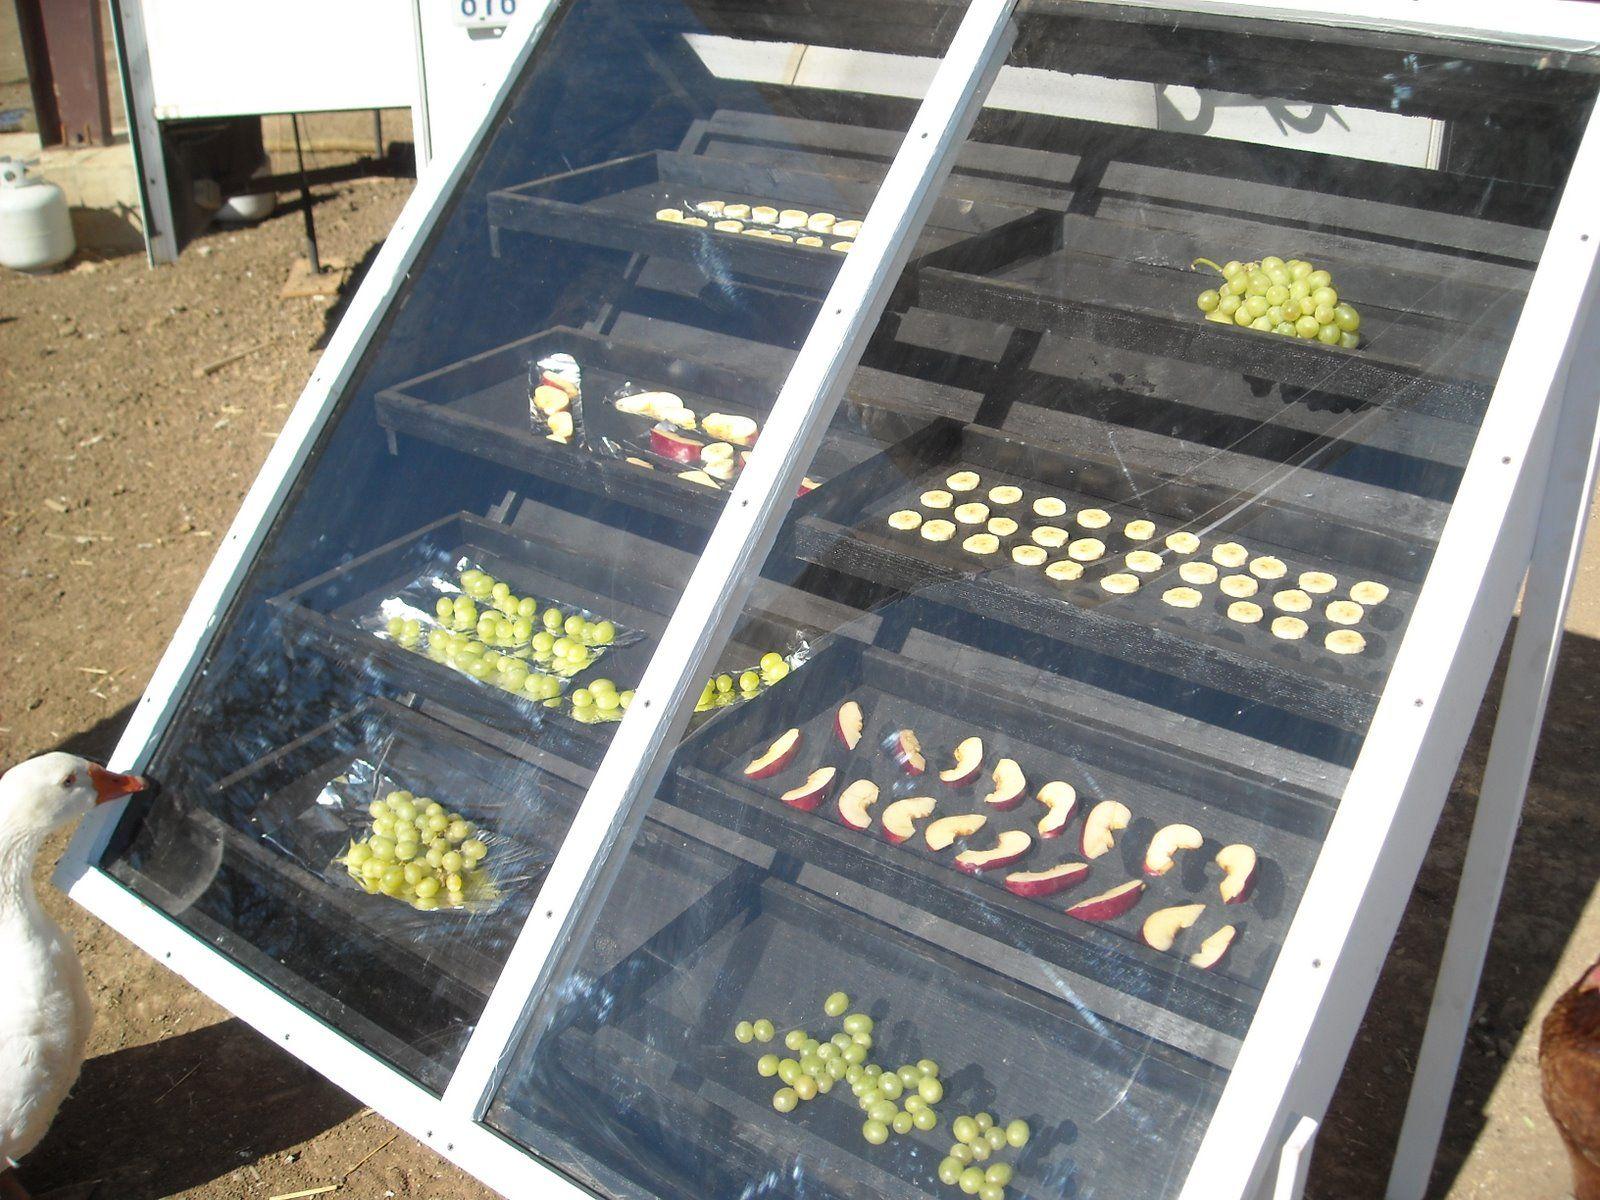 Food drying rack, air, solar.. Look at that goose :-D